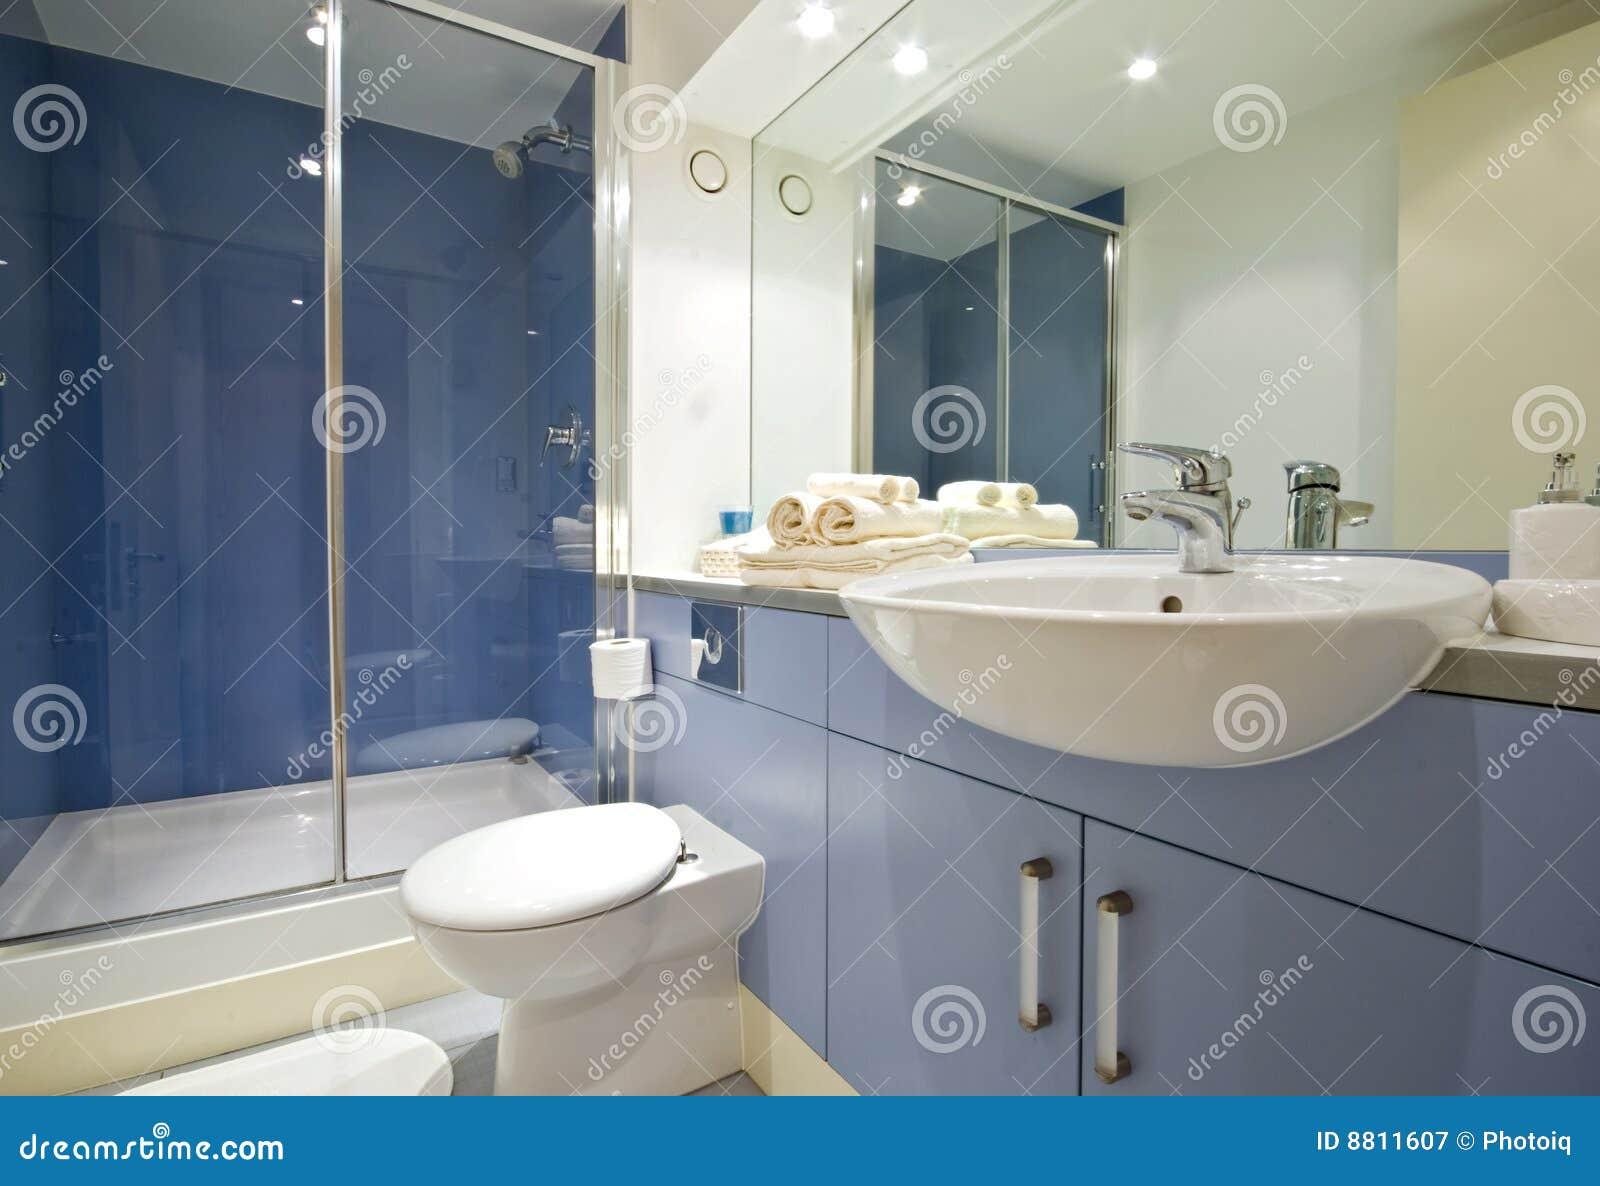 Salle de bains bleue photographie stock libre de droits for Salle de bain bleue